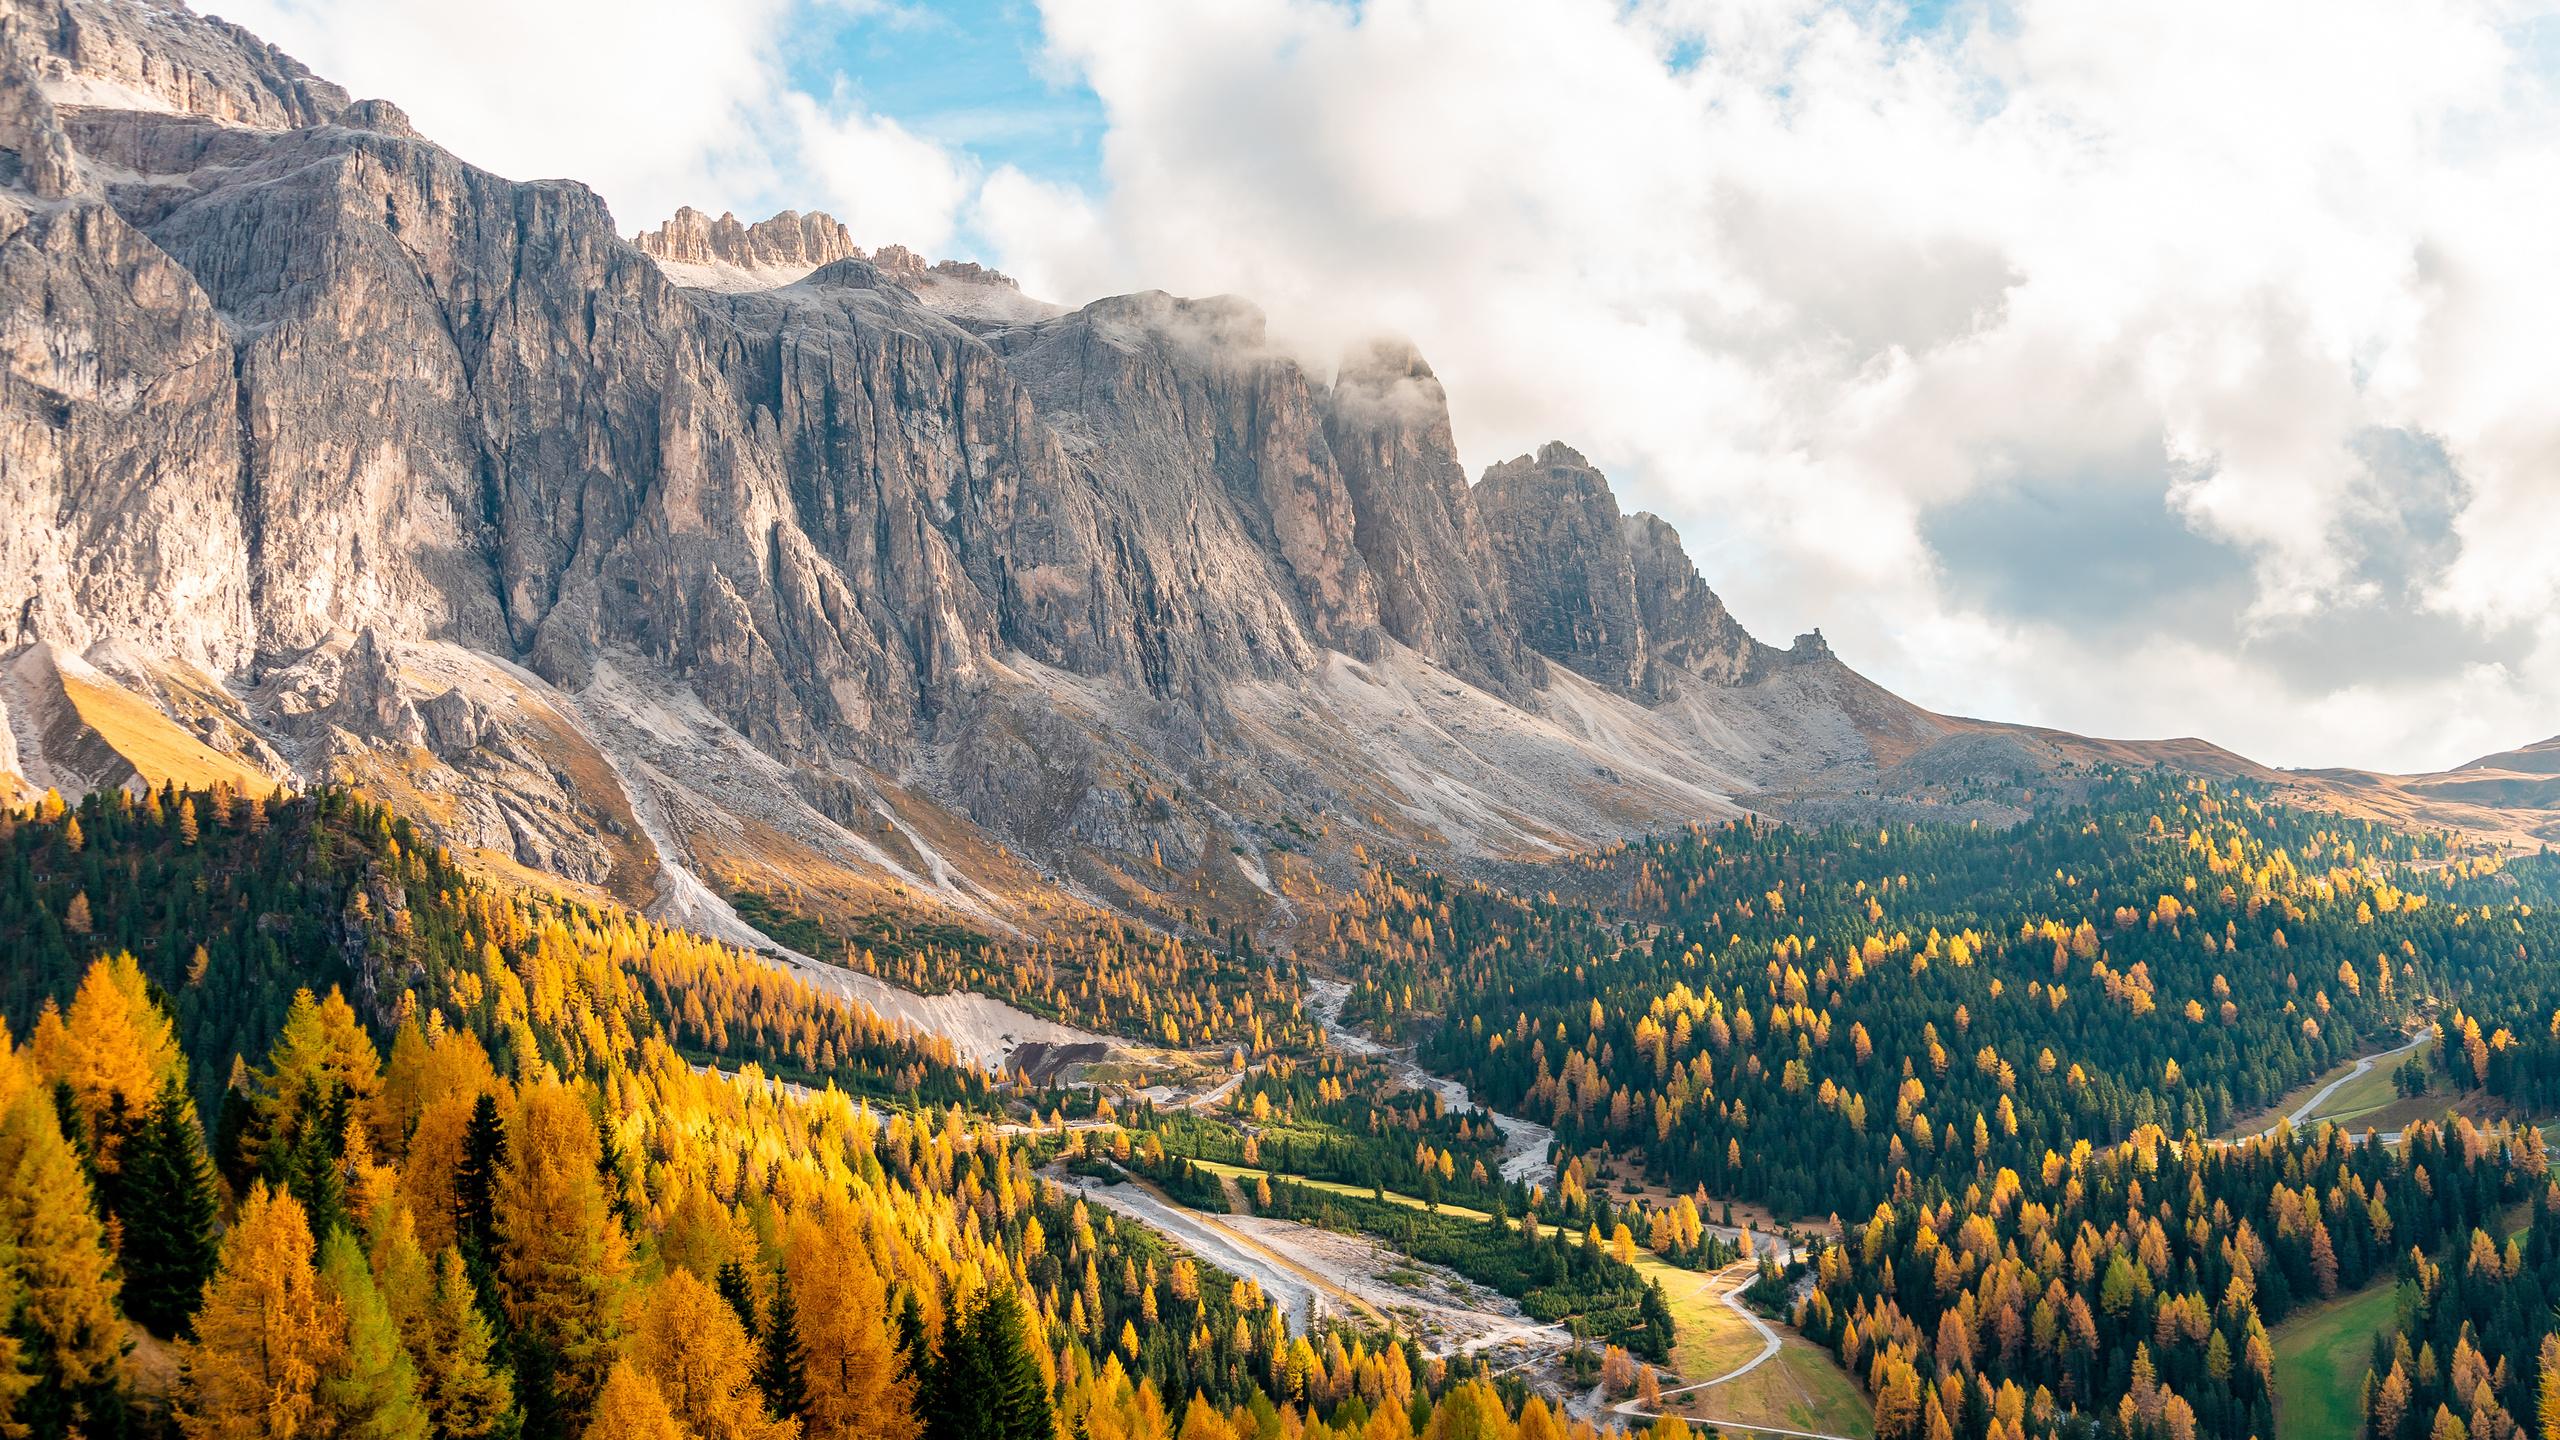 осень, горы, италия, лес, passo gardena, south tyrol, dolomite, alps, природа